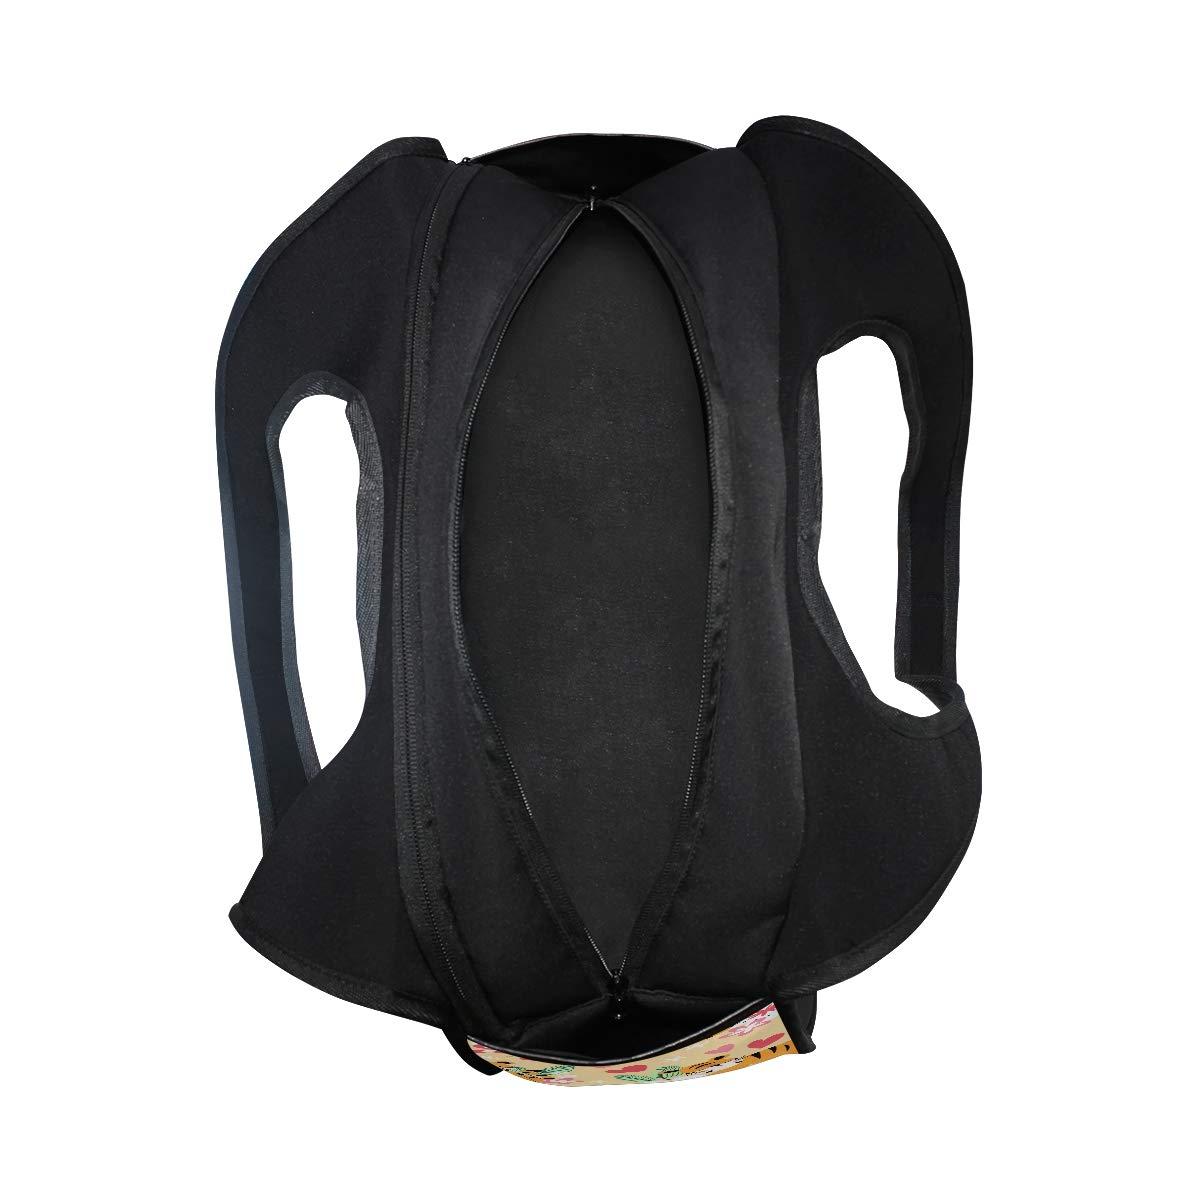 Cartoon Tiger With Floral Pattern Women Sports Gym Totes Bag Multi-Function Nylon Travel Shoulder Bag